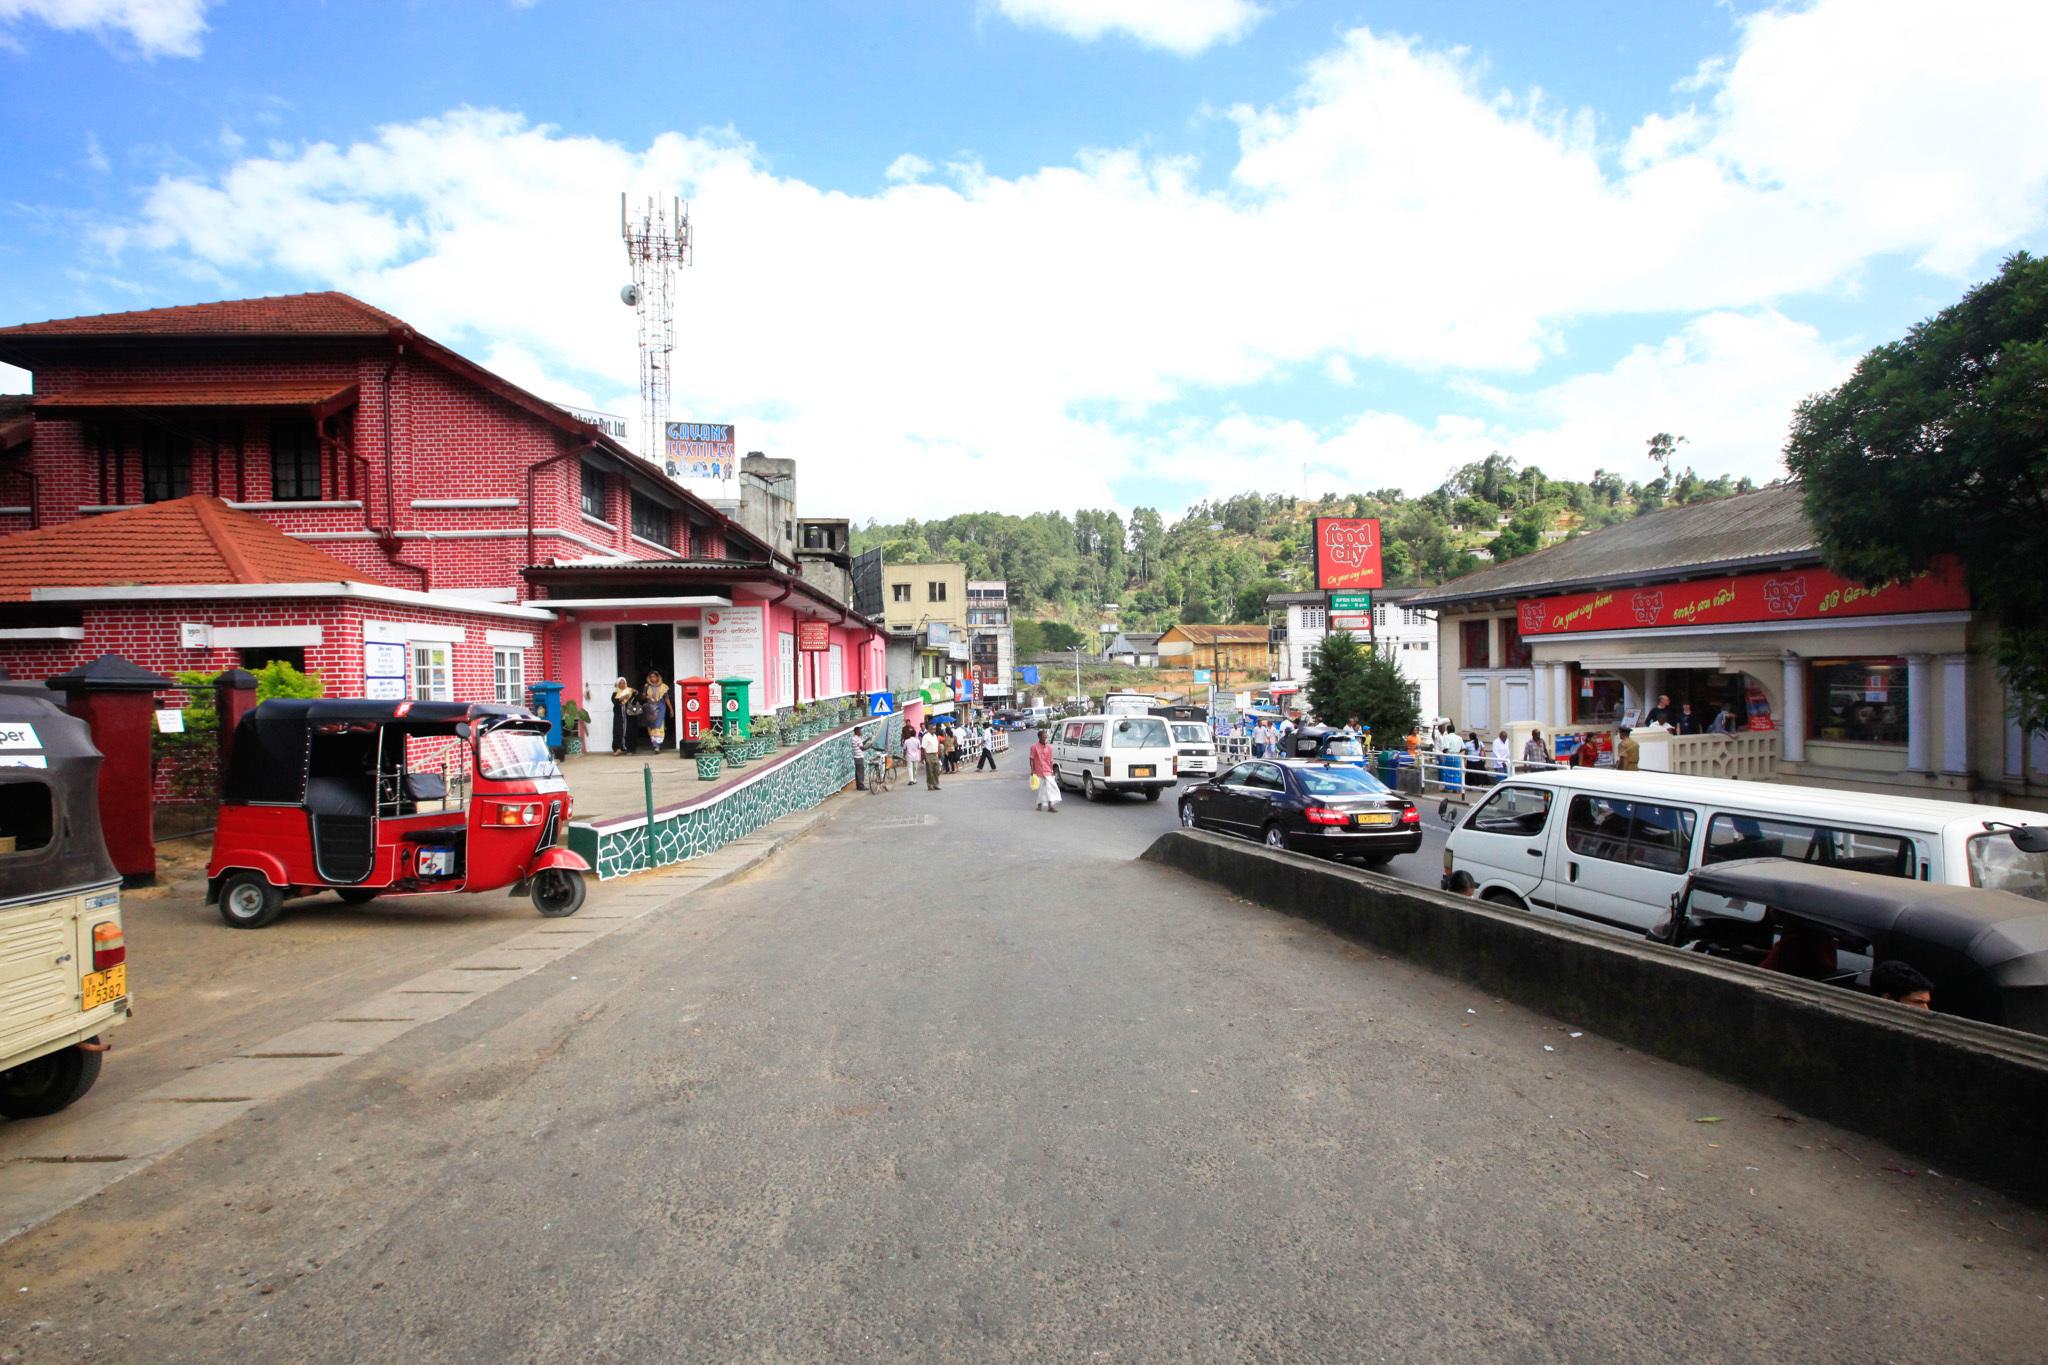 Bandawela is a town in Badulla